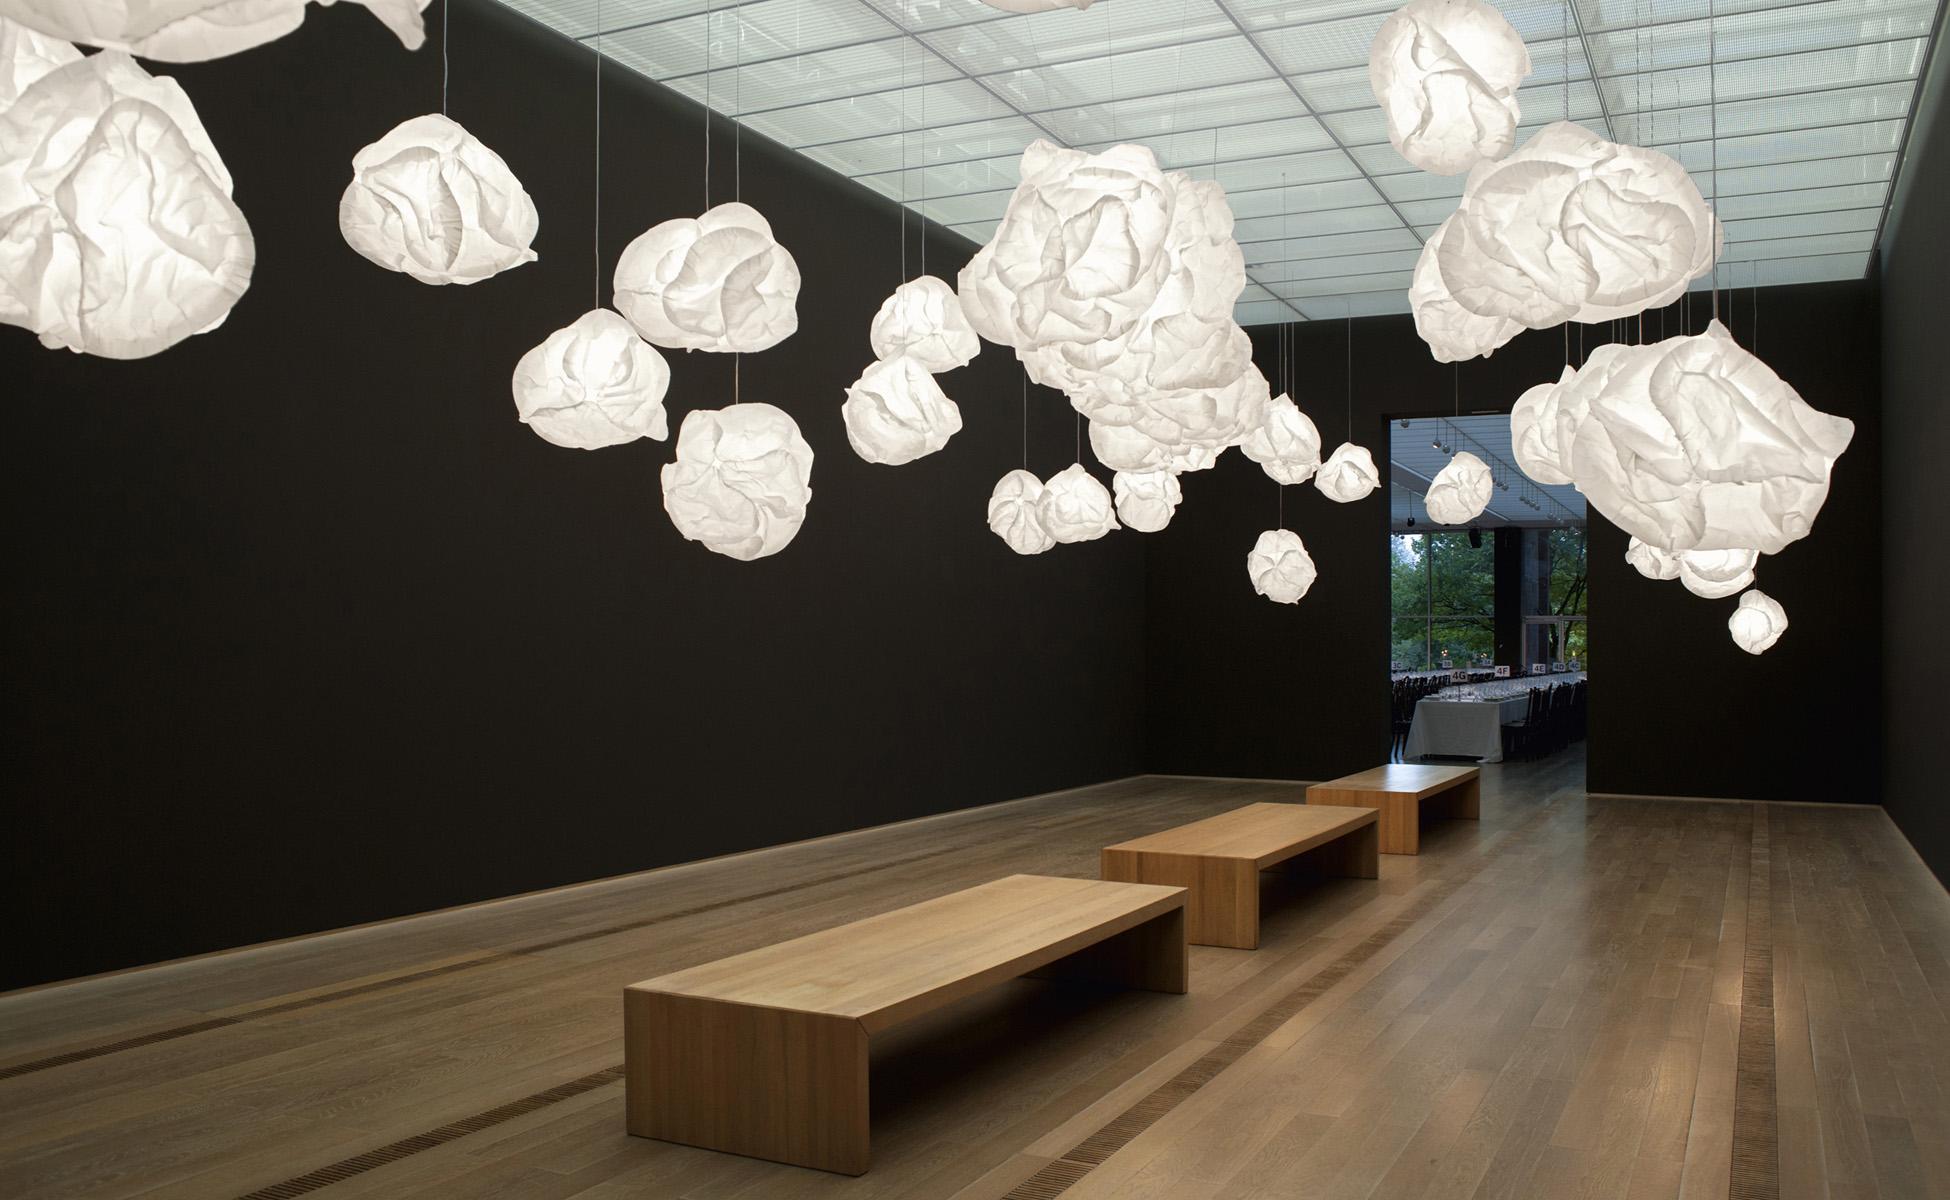 Belux Cloud Leuchte in Berlin bei steidten+